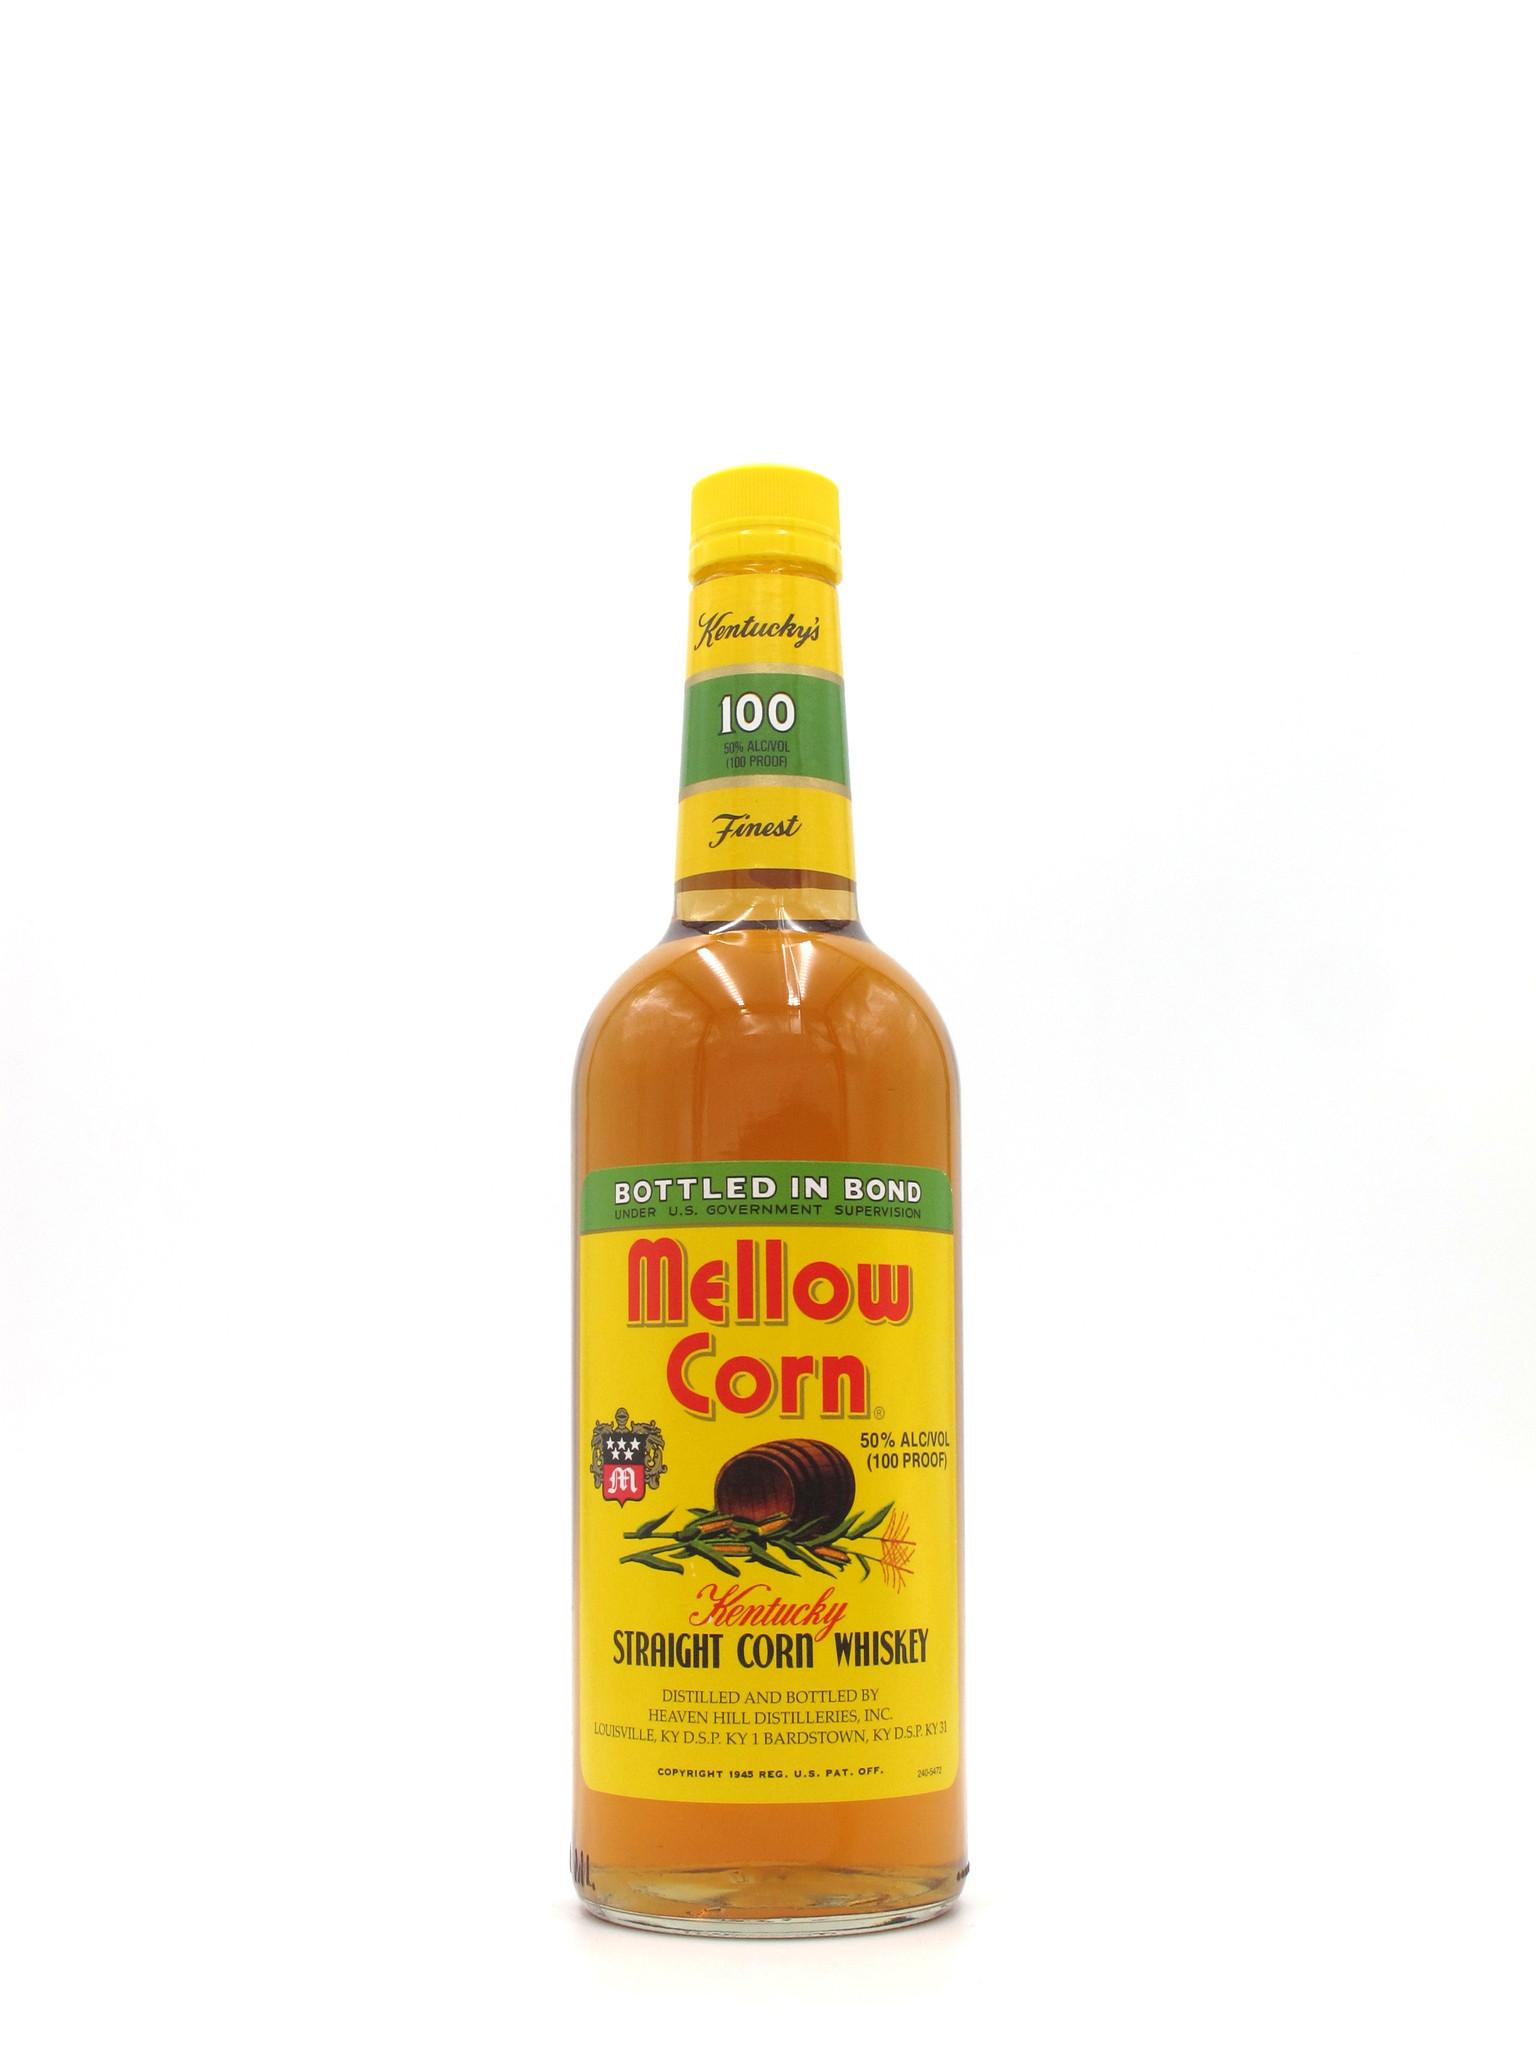 Mellow Corn Mellow Corn Straight Corn Whiskey 750ml